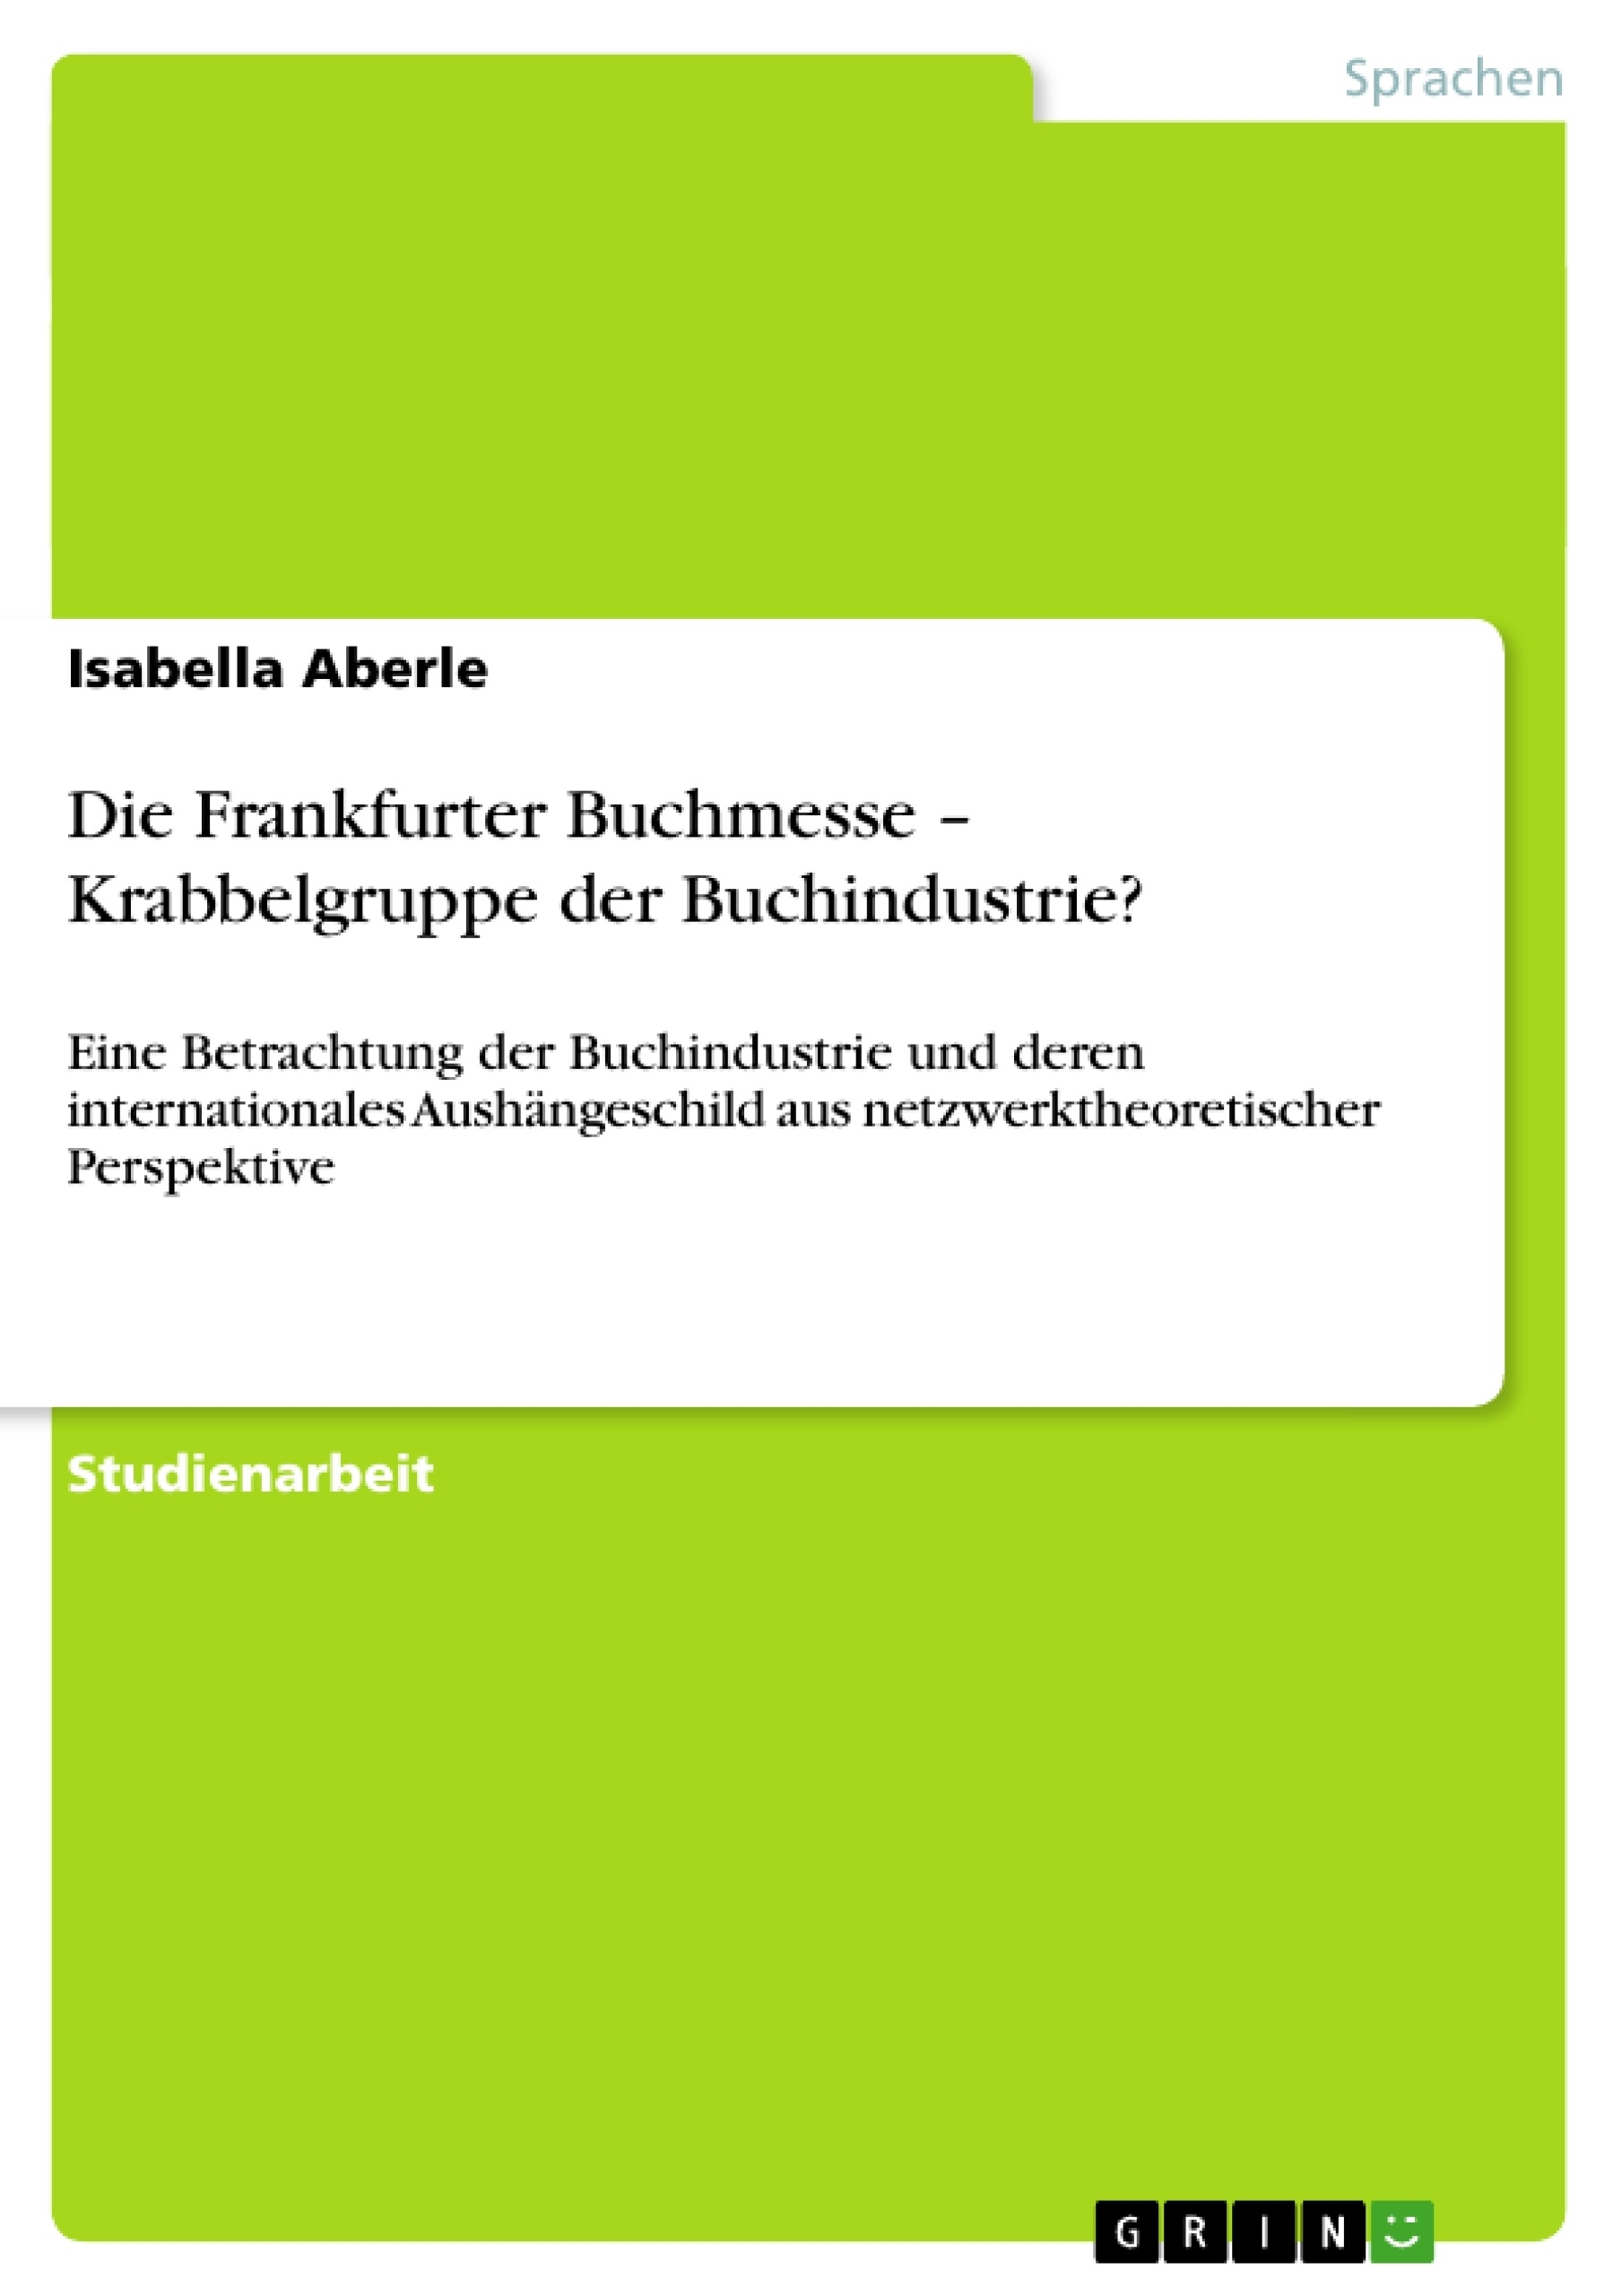 Titel: Die Frankfurter Buchmesse – Krabbelgruppe der Buchindustrie?